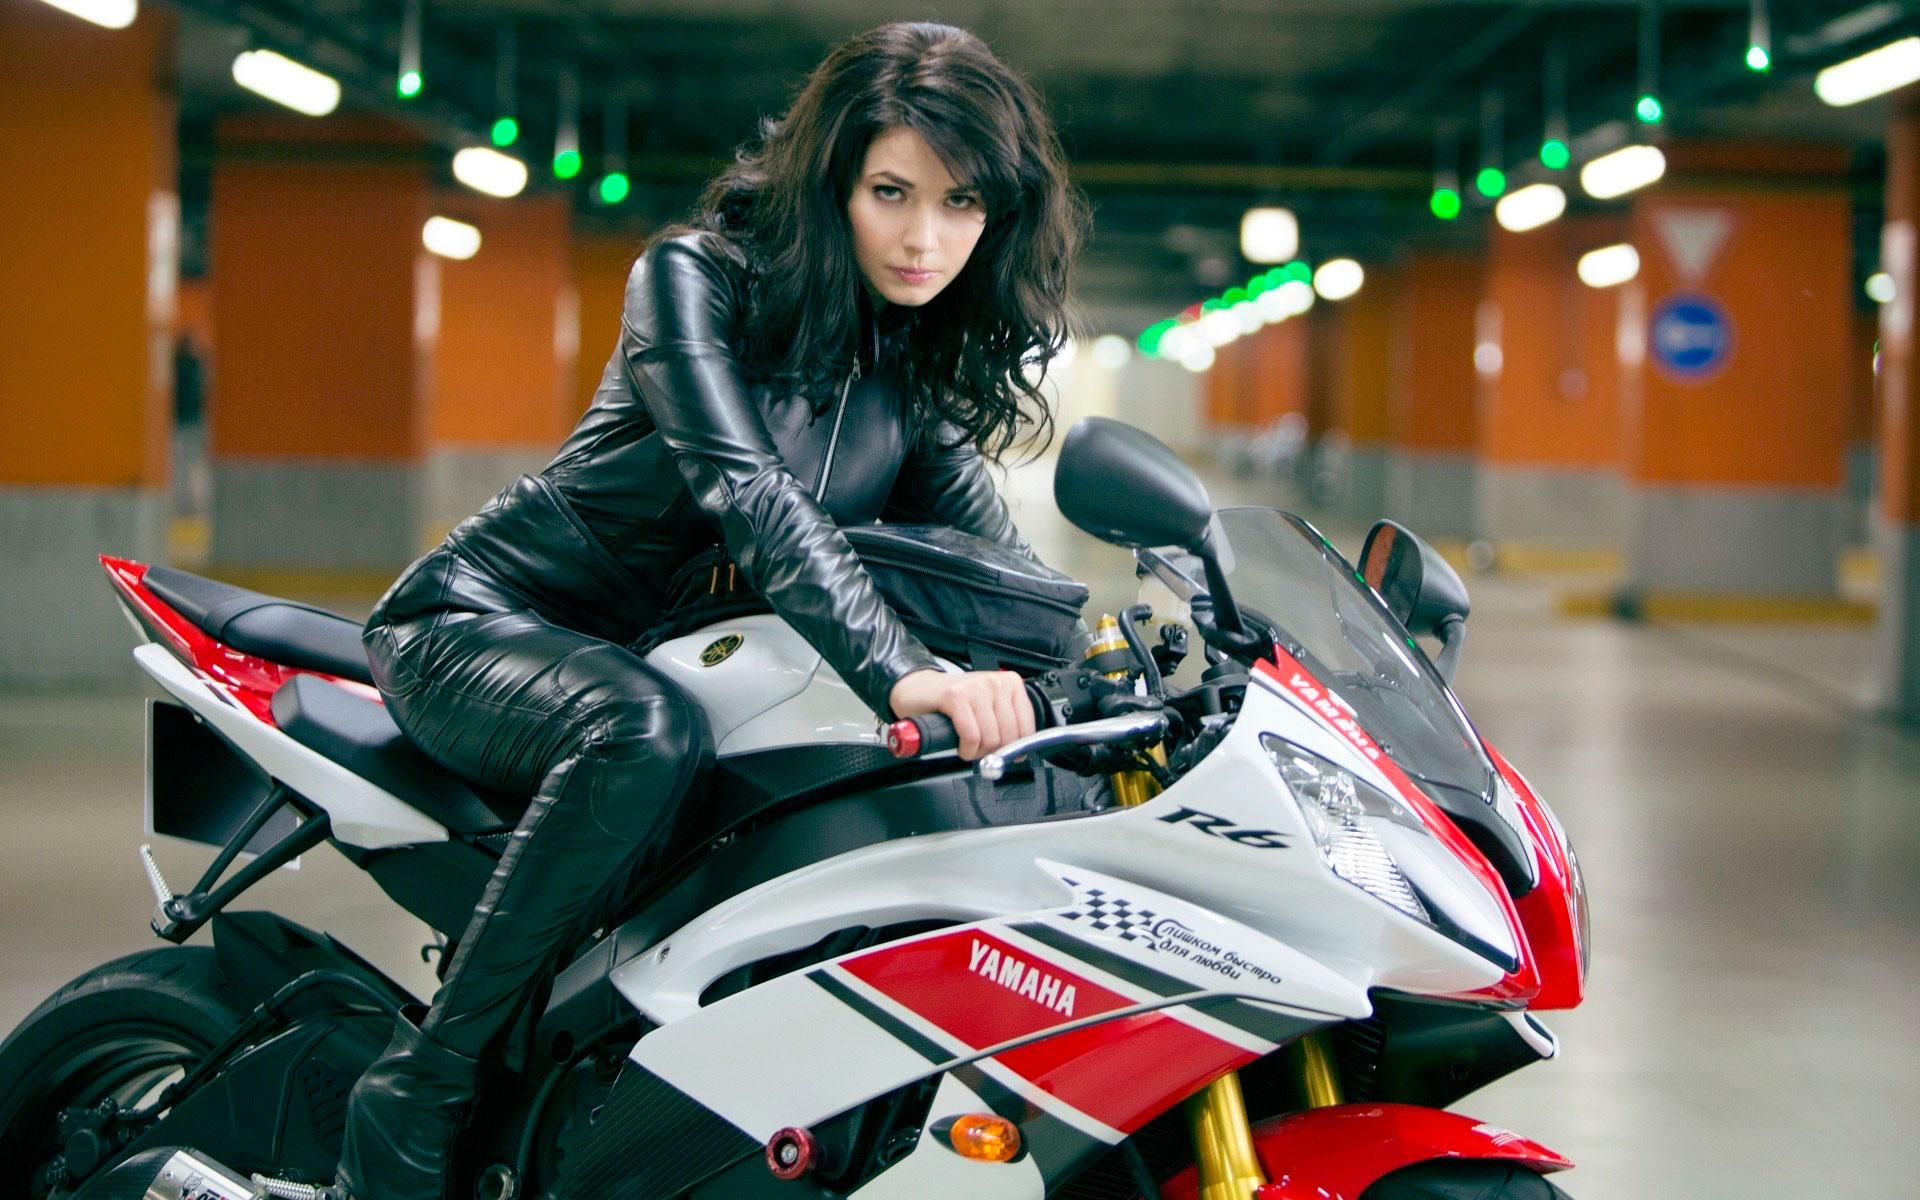 Обой красива девушка мотоцикл порно